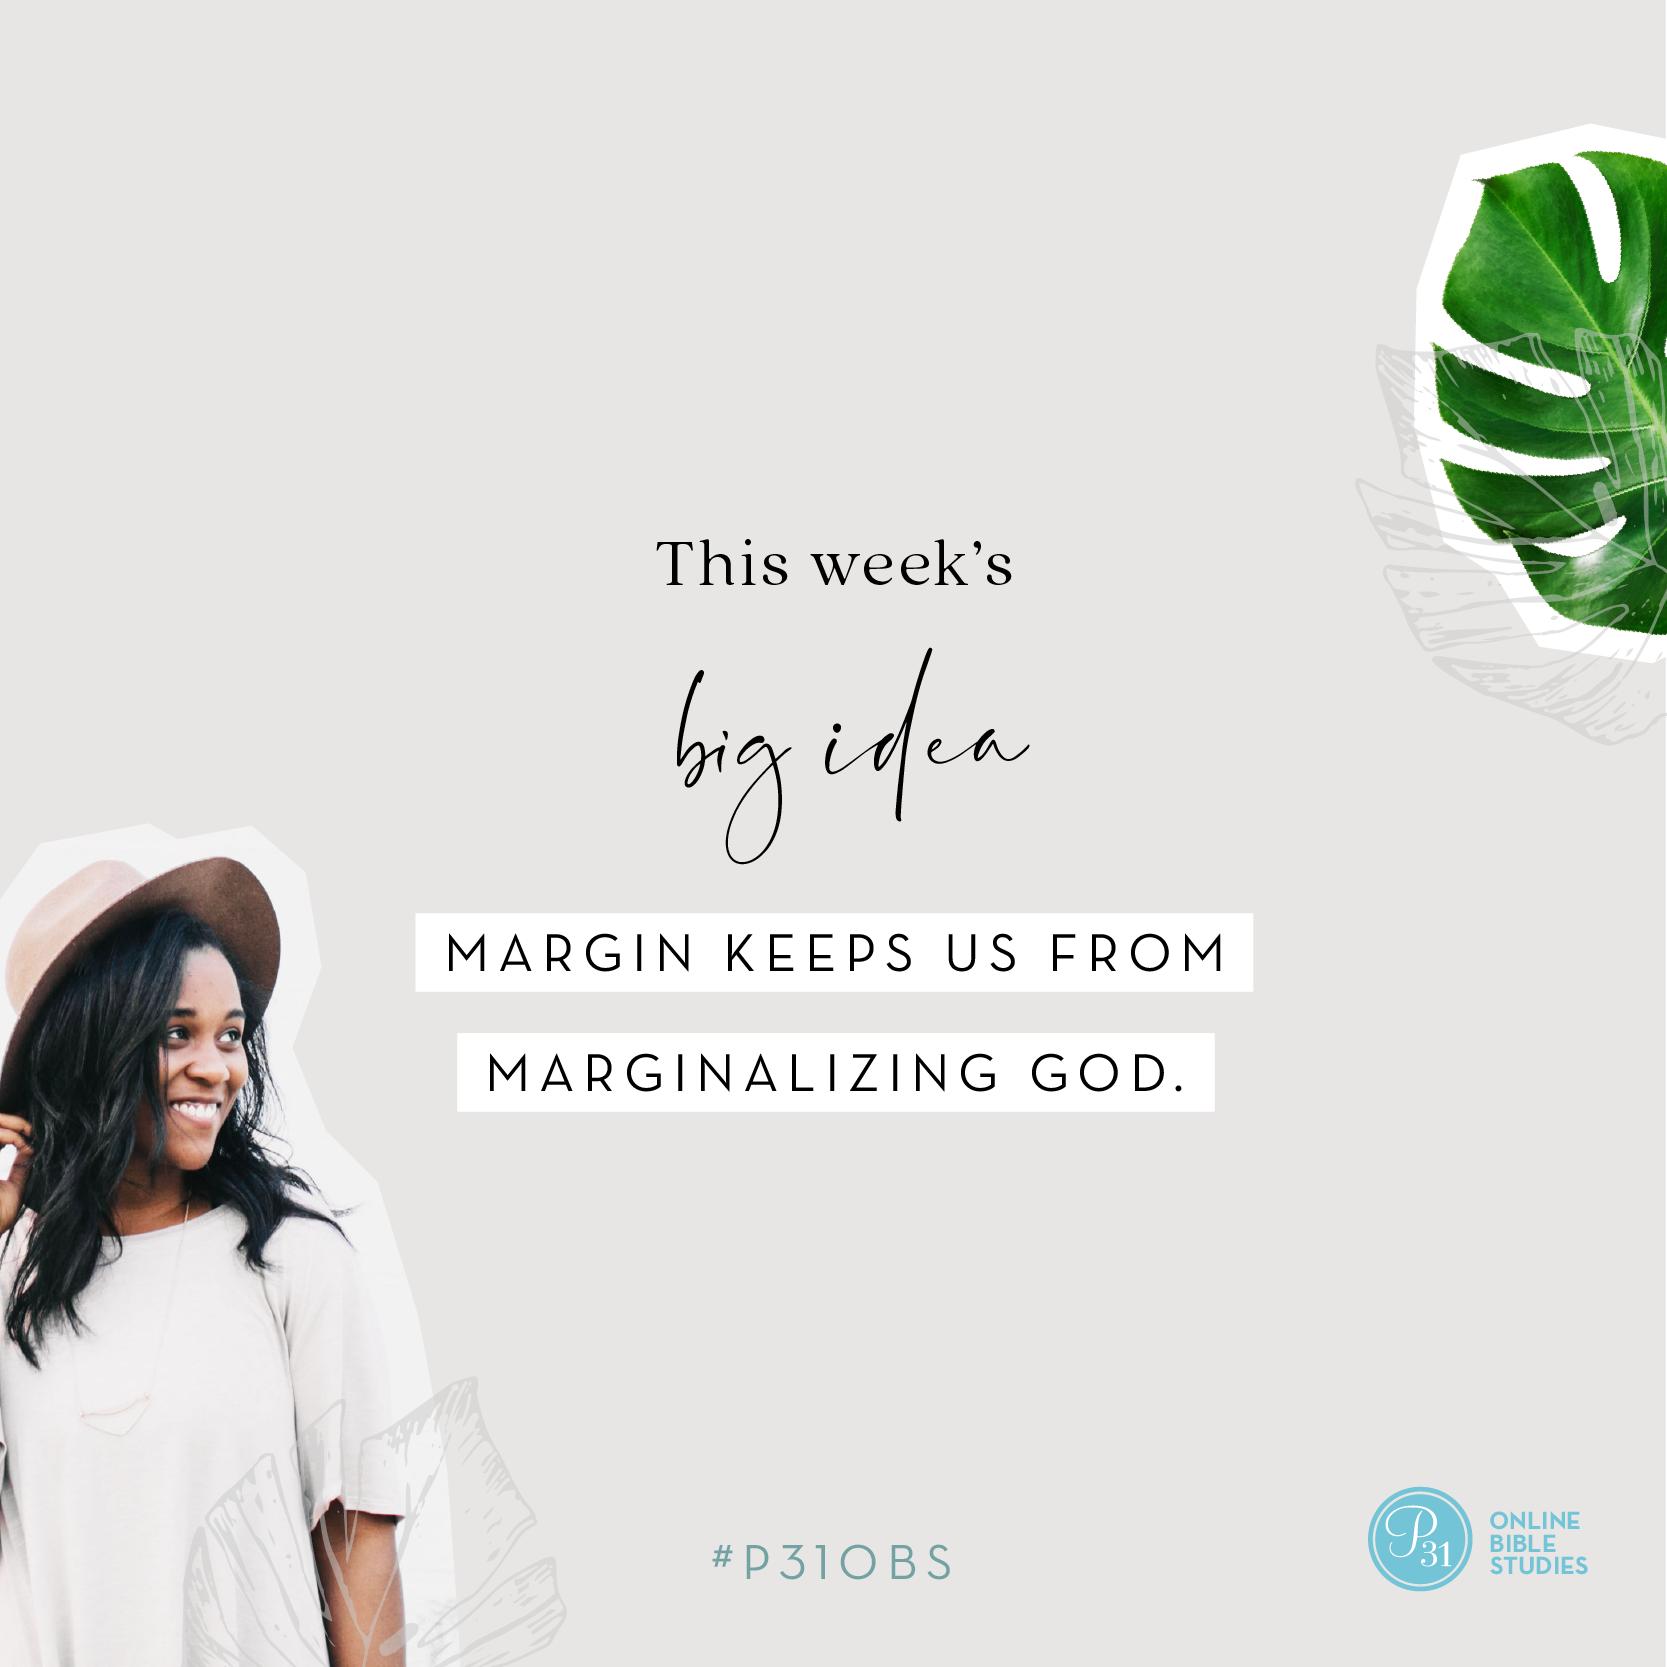 """Margin keeps us from marginalizing God."" - Priscilla Shirer #SabbathMargin | Proverbs 31 Online Bible Studies Week 4 #P31OBS"